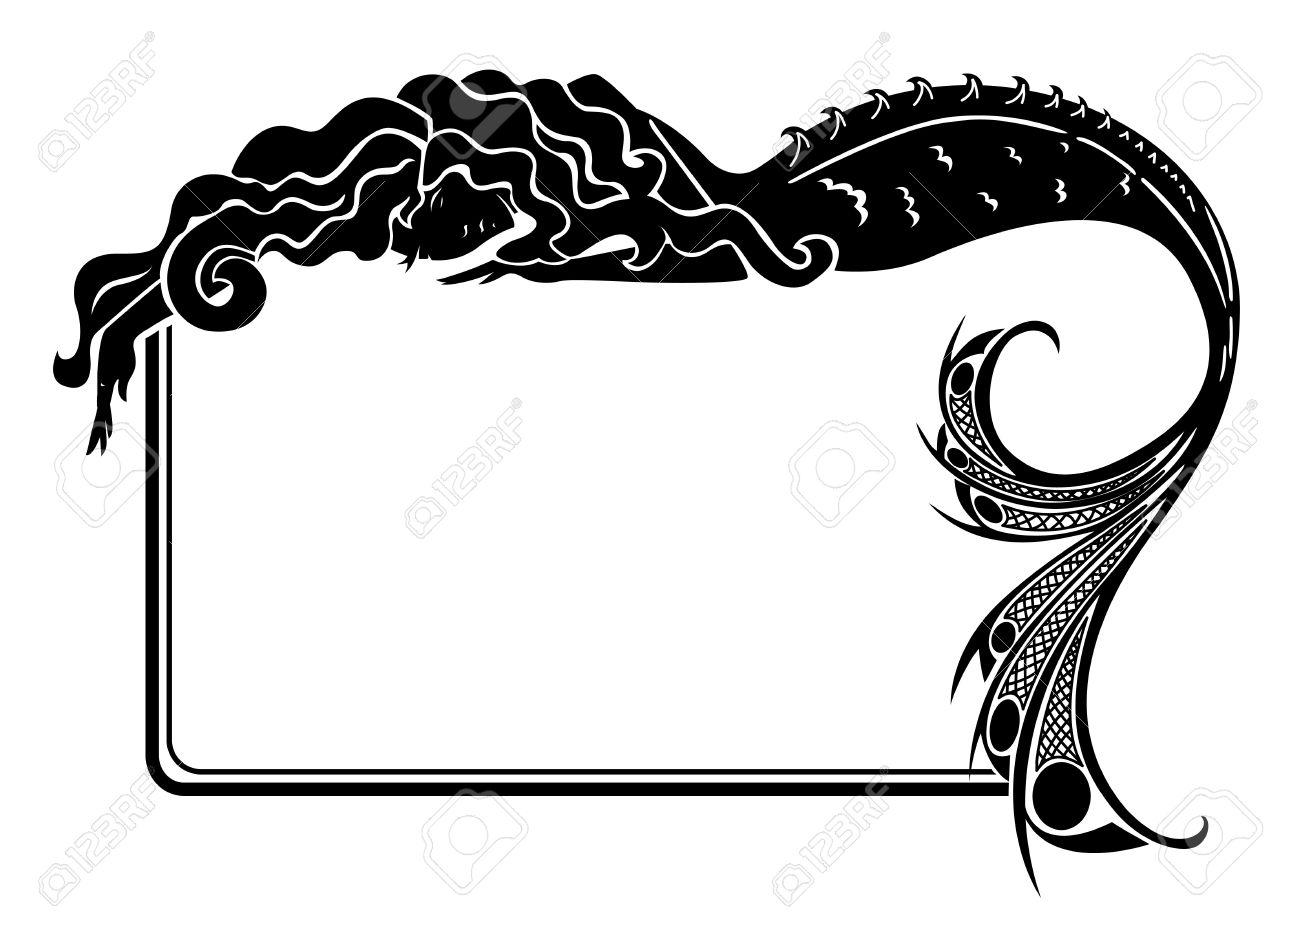 Art-nouveau Mermaid Silhouette Frame Royalty Free Cliparts, Vectors ...